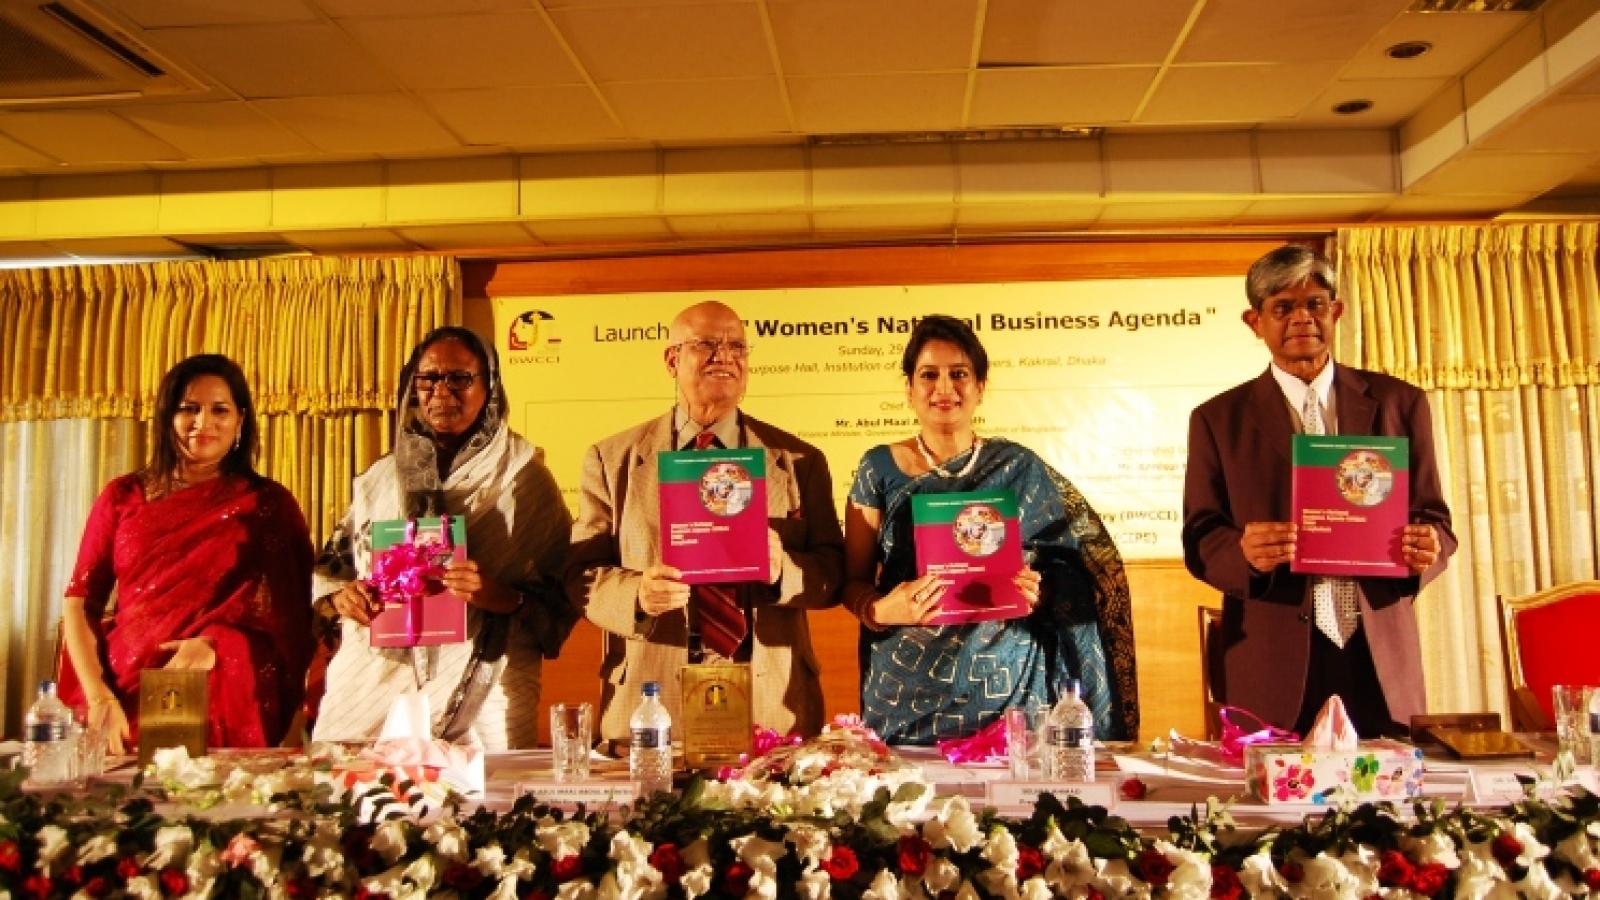 At WNBA launching with Finance Minister, Bangladesh Bank Governor